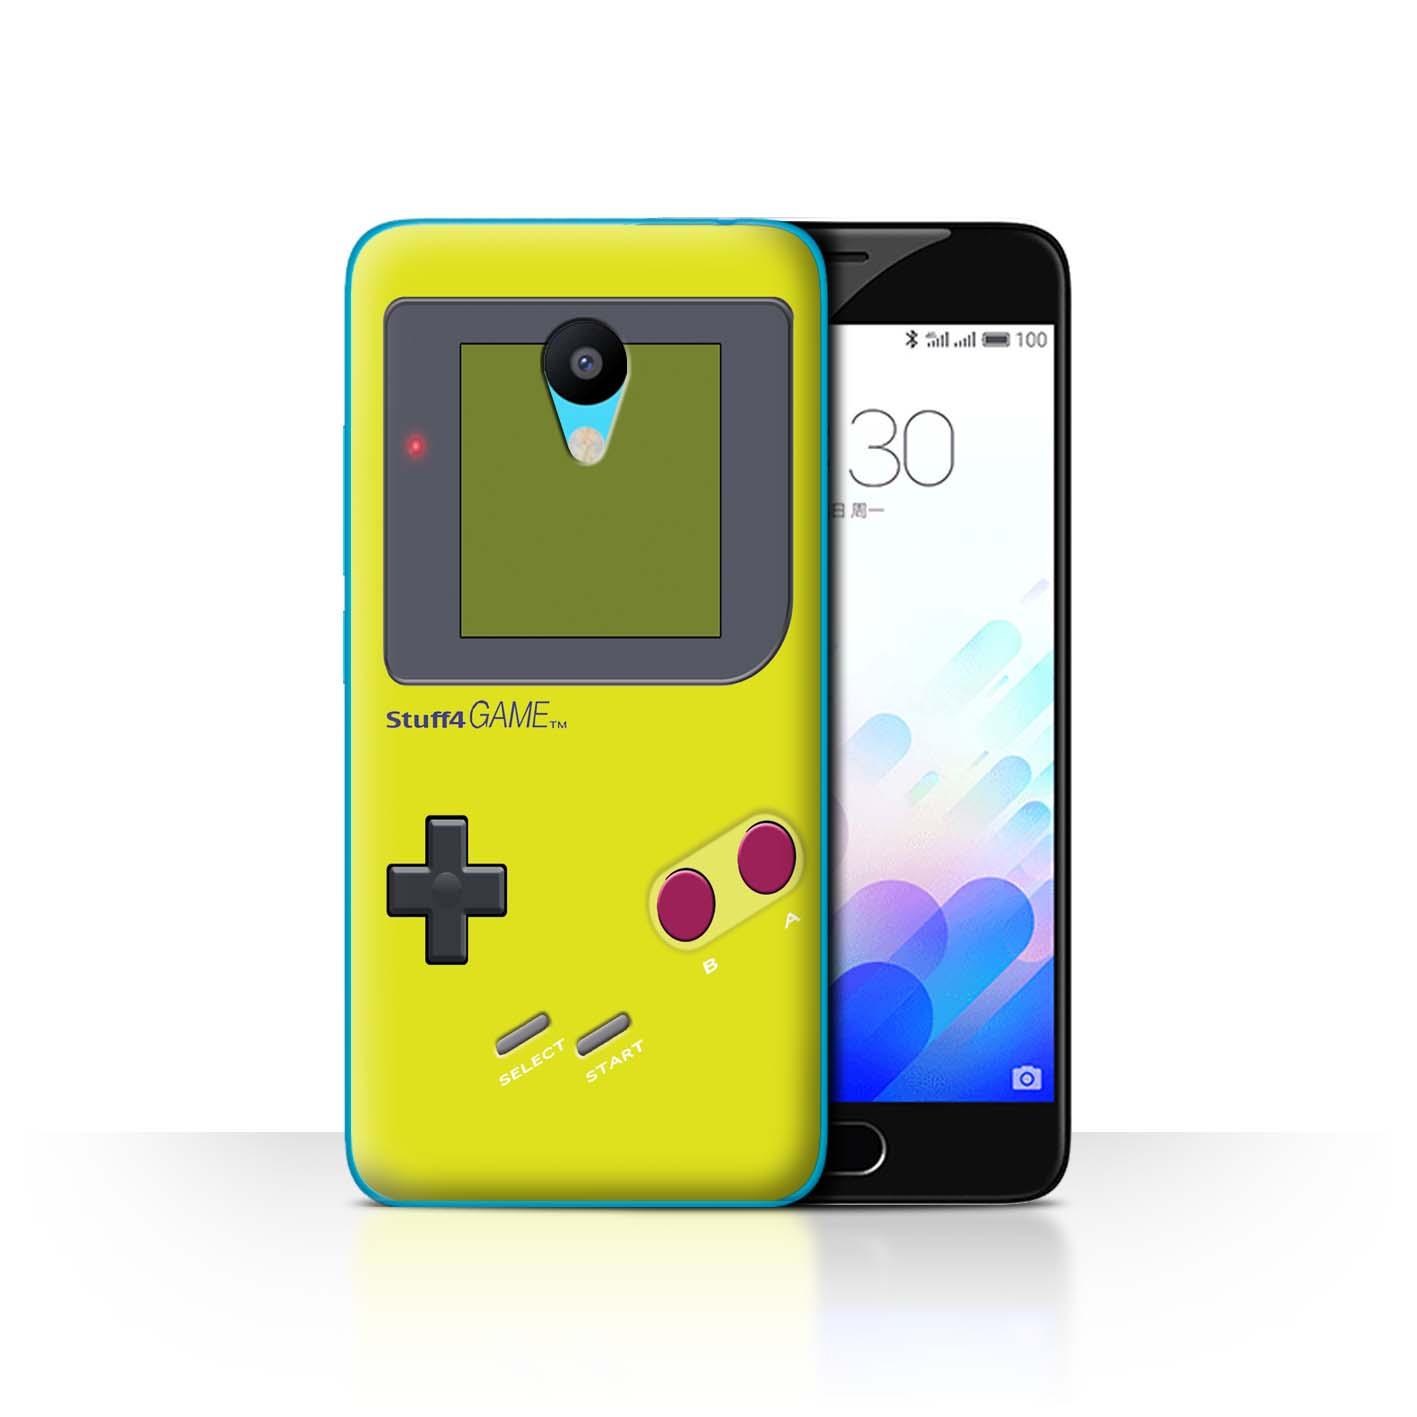 STUFF4-Back-Case-Cover-Skin-for-Meizu-M3-Video-Gamer-Gameboy